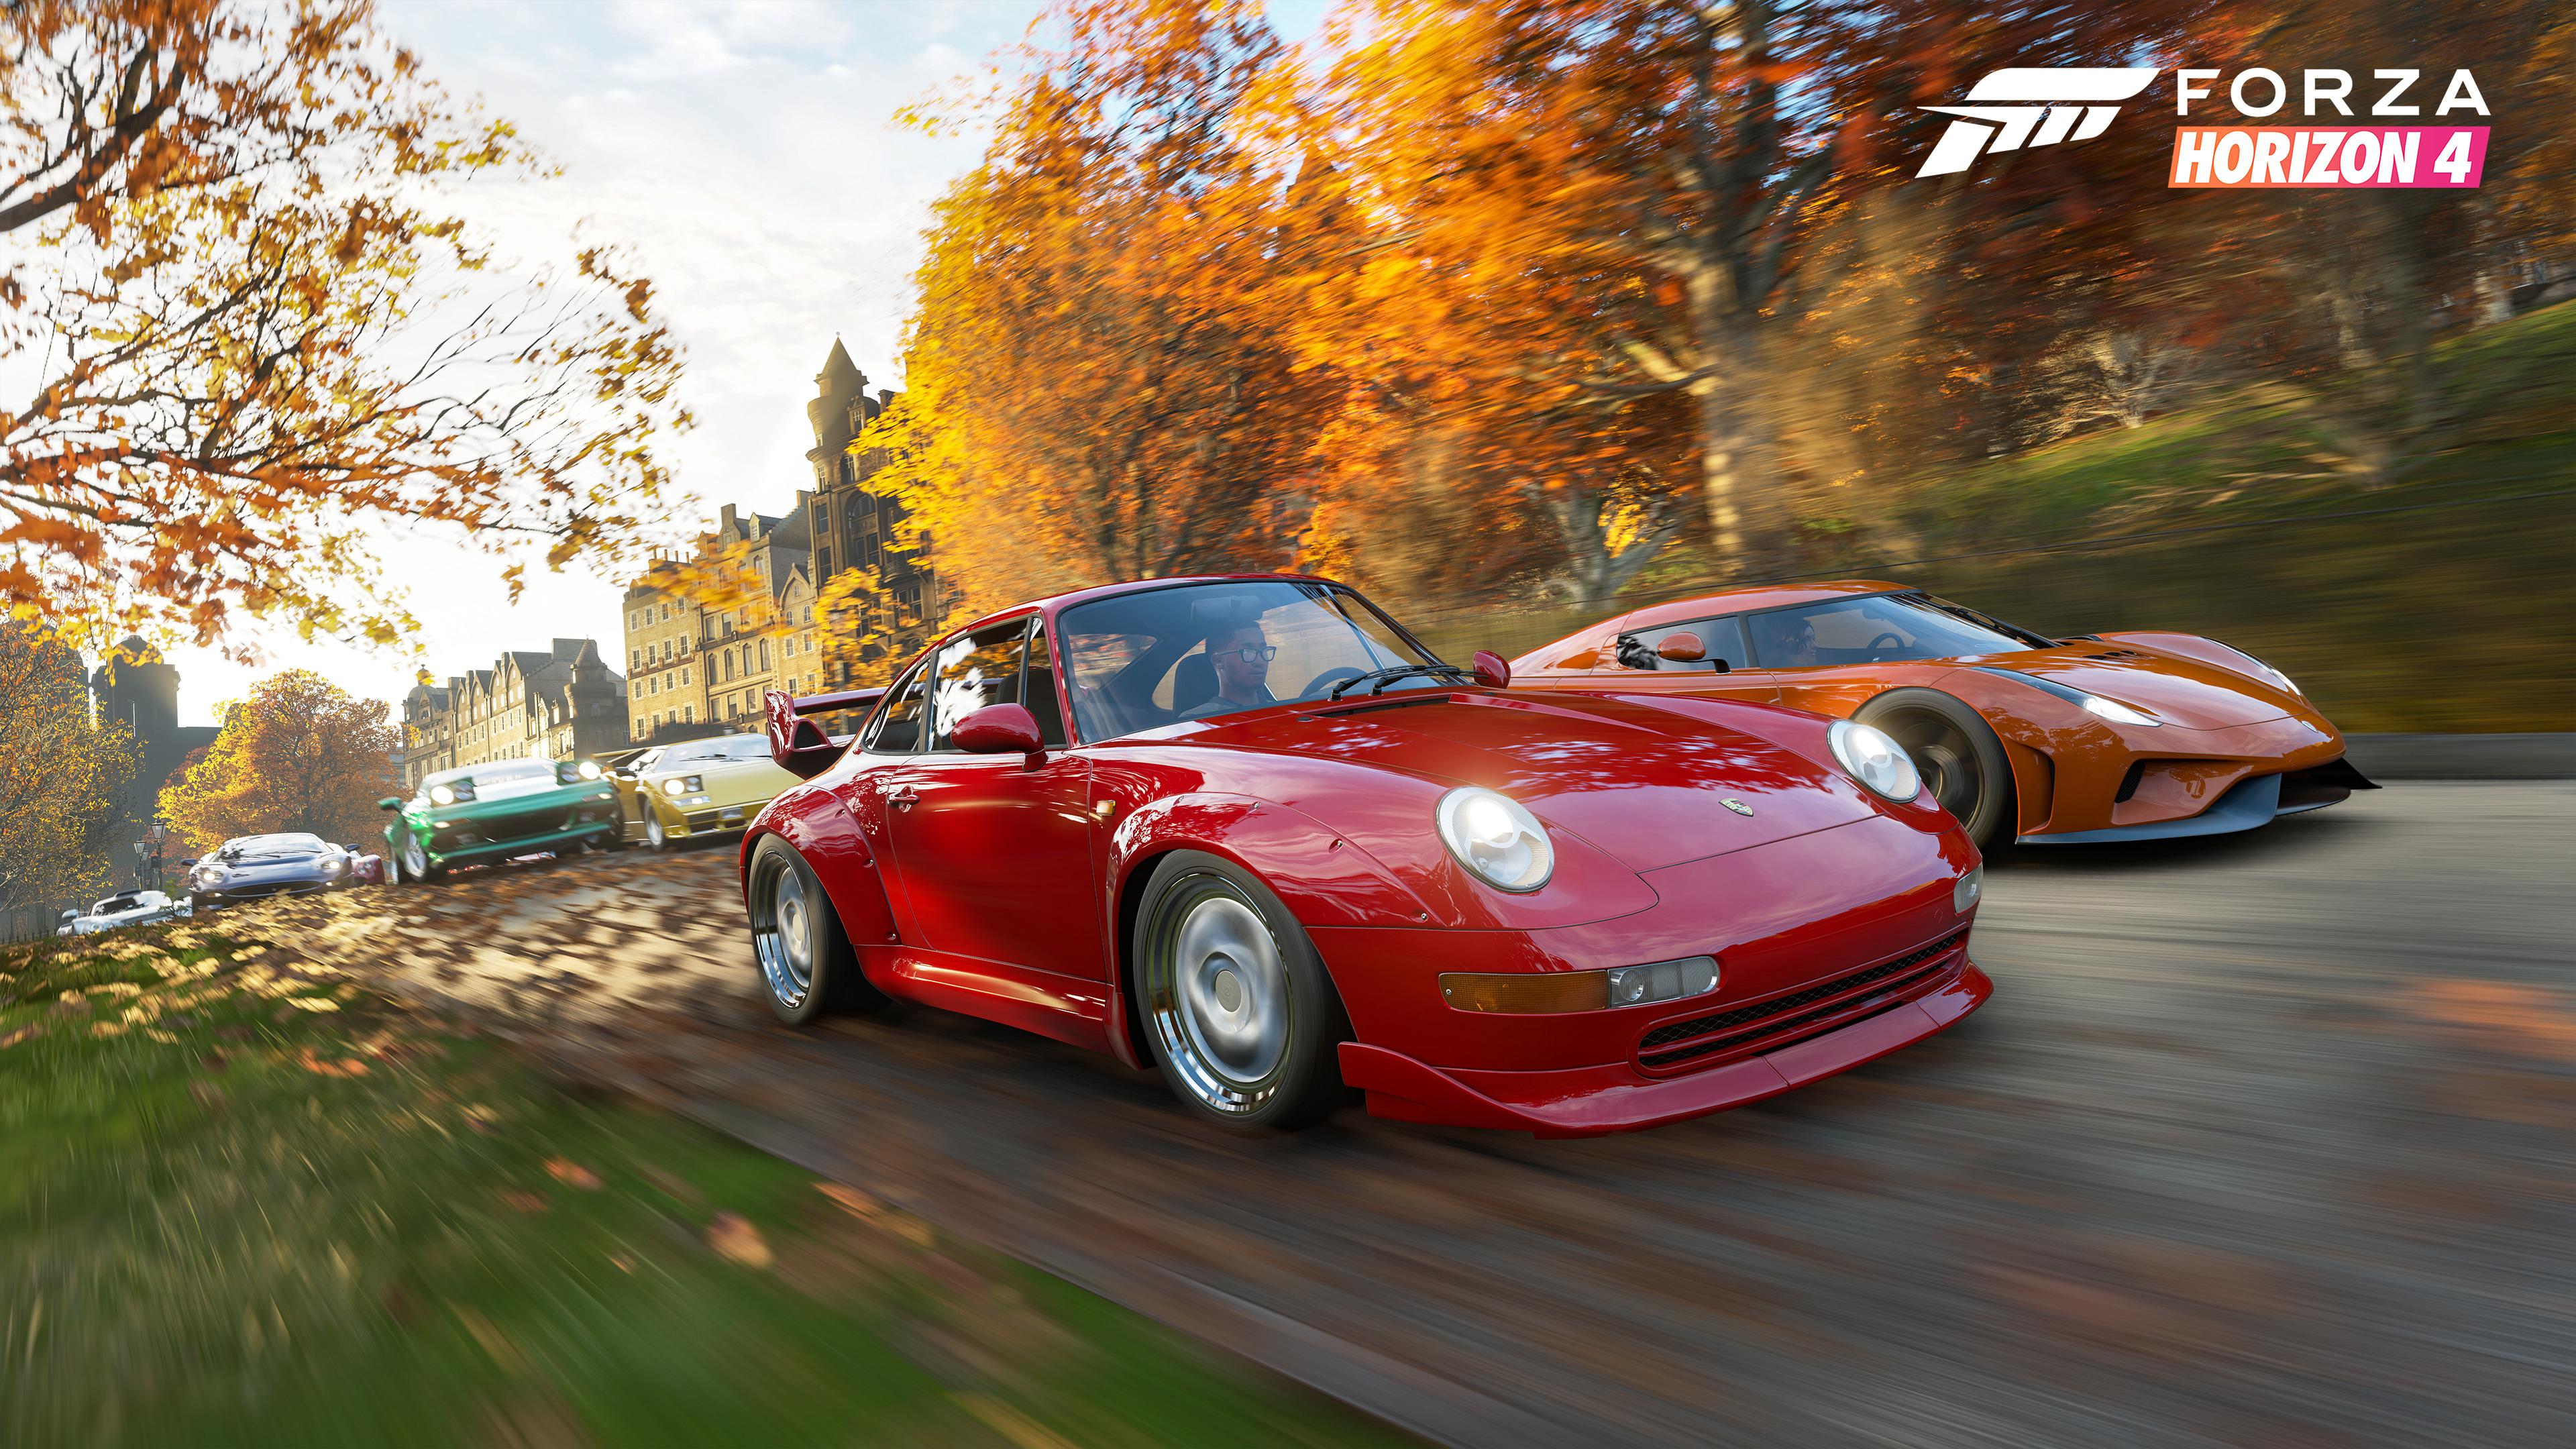 Forza Horizon 4 4k Hd Games 4k Wallpapers Images